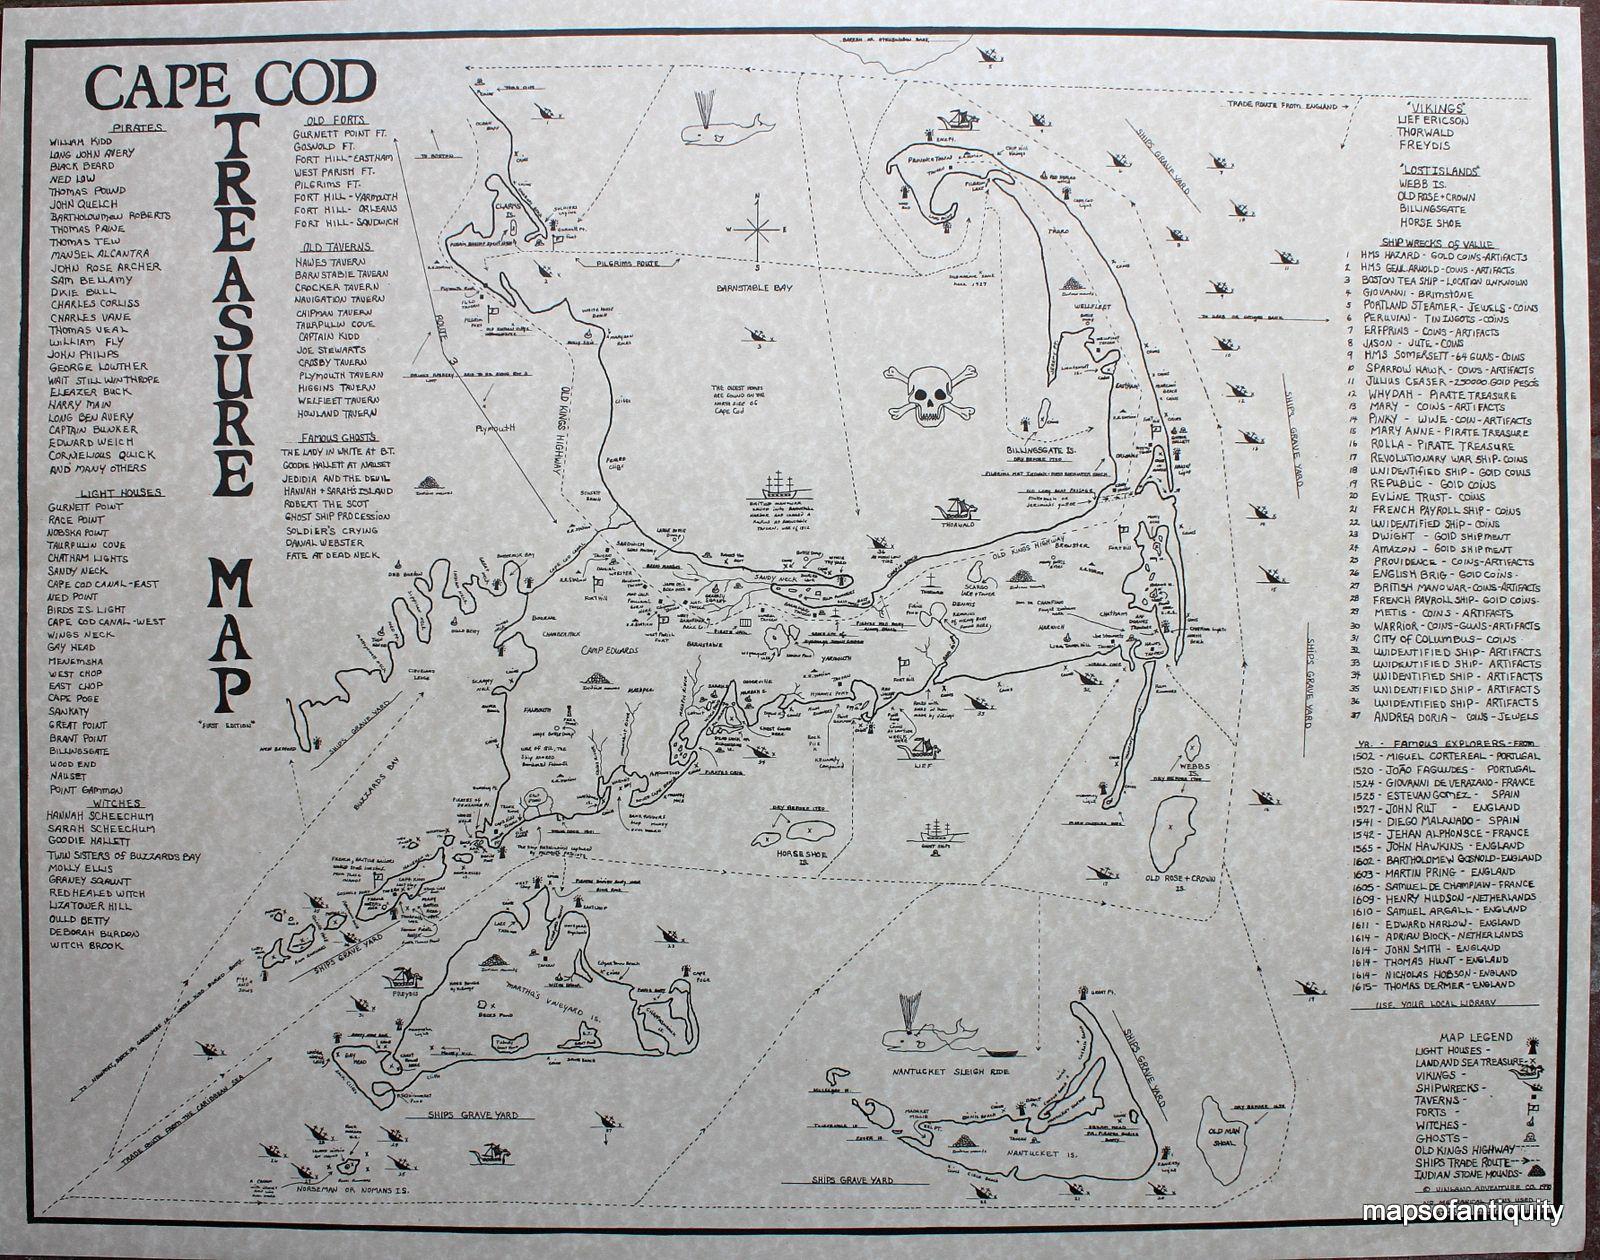 Cape Cod Treasure Map Great for Halloween